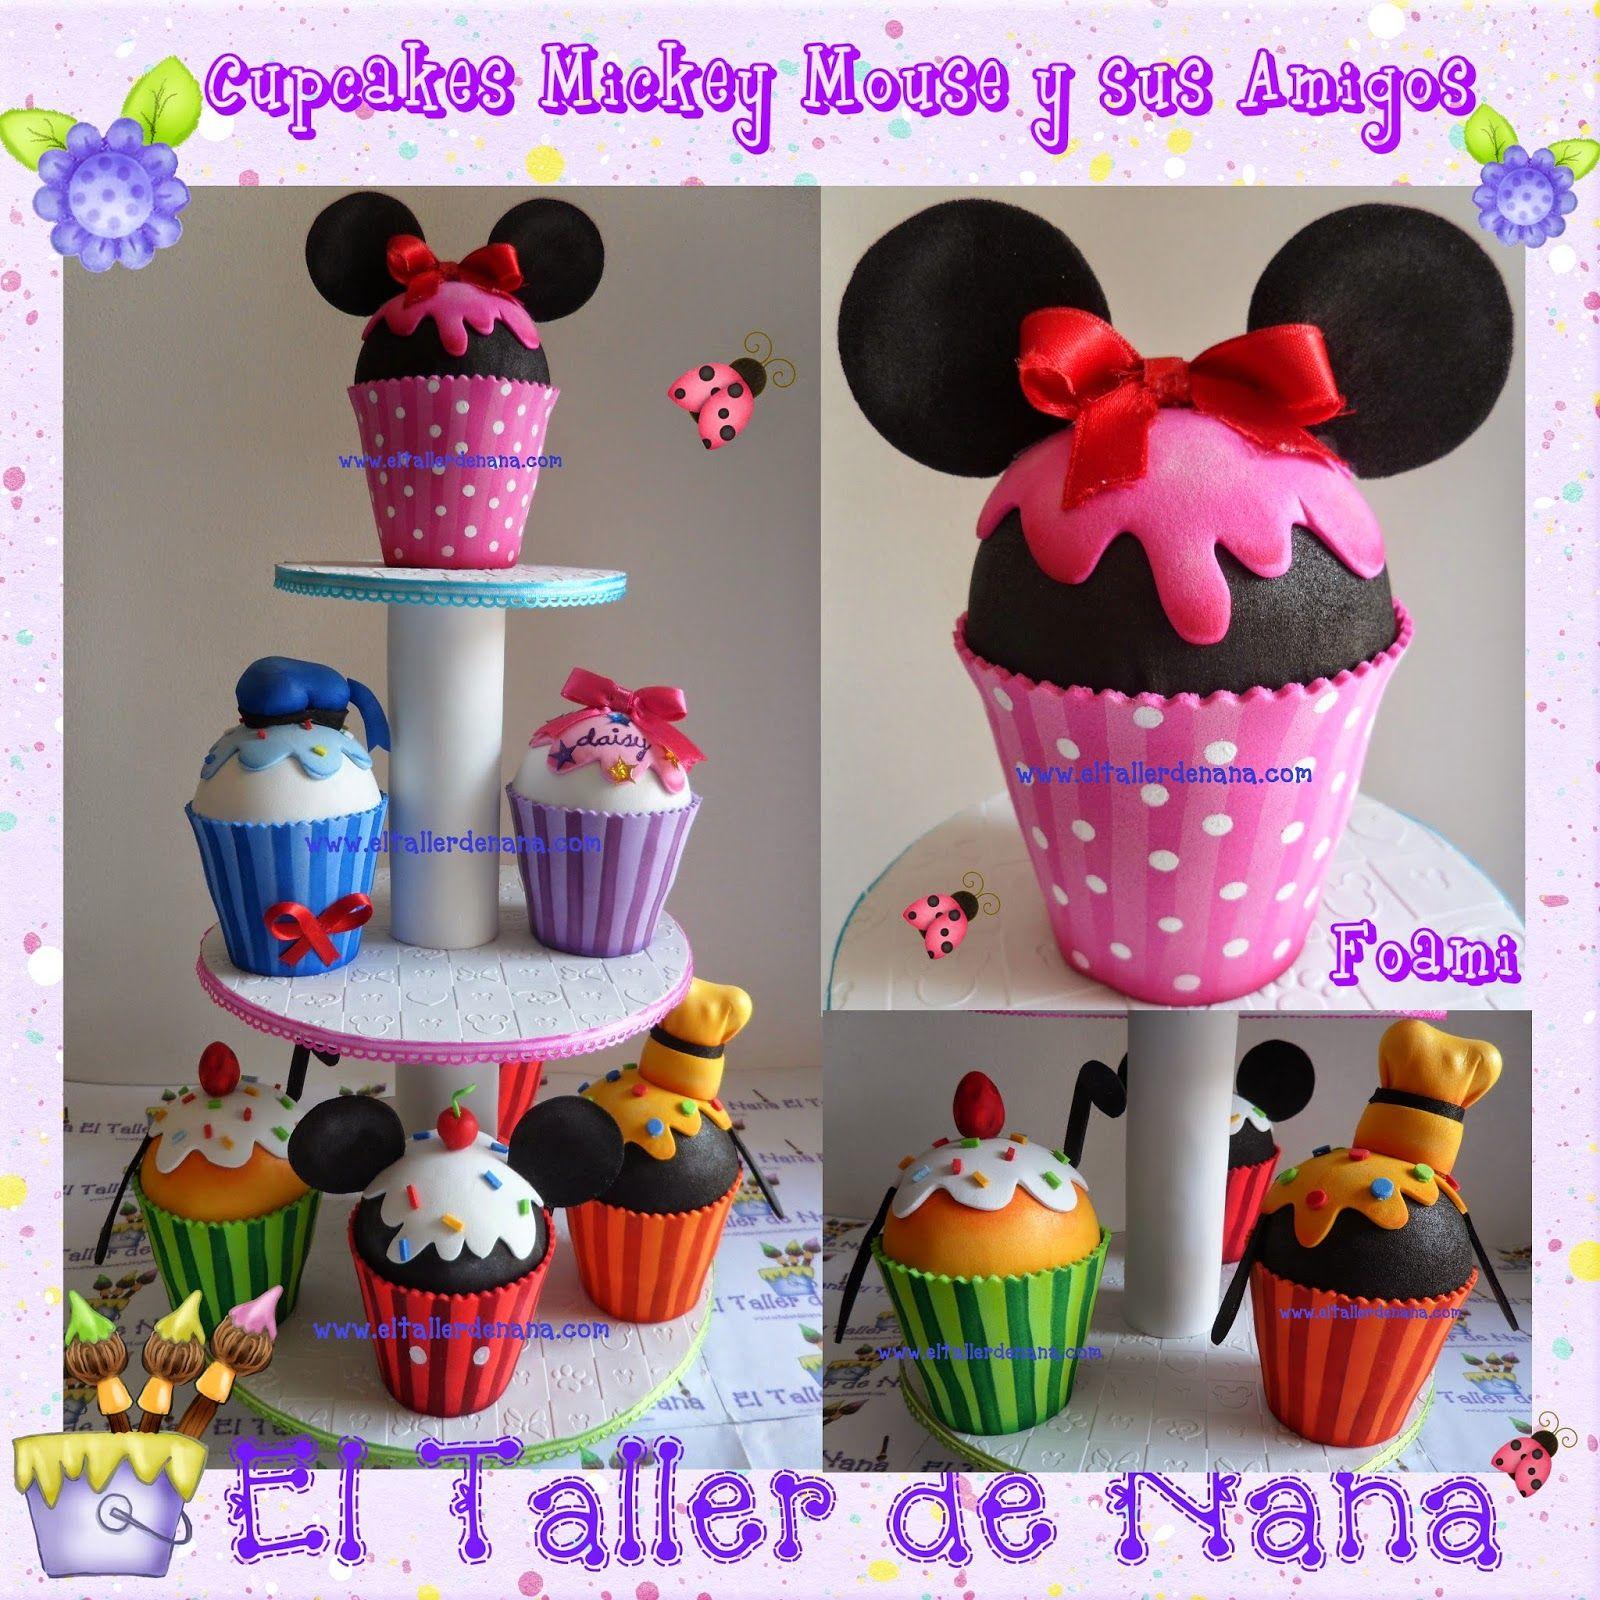 Cupcakes de mickey mouse y sus amigos minnie pato donald - Manualidades minnie mouse ...